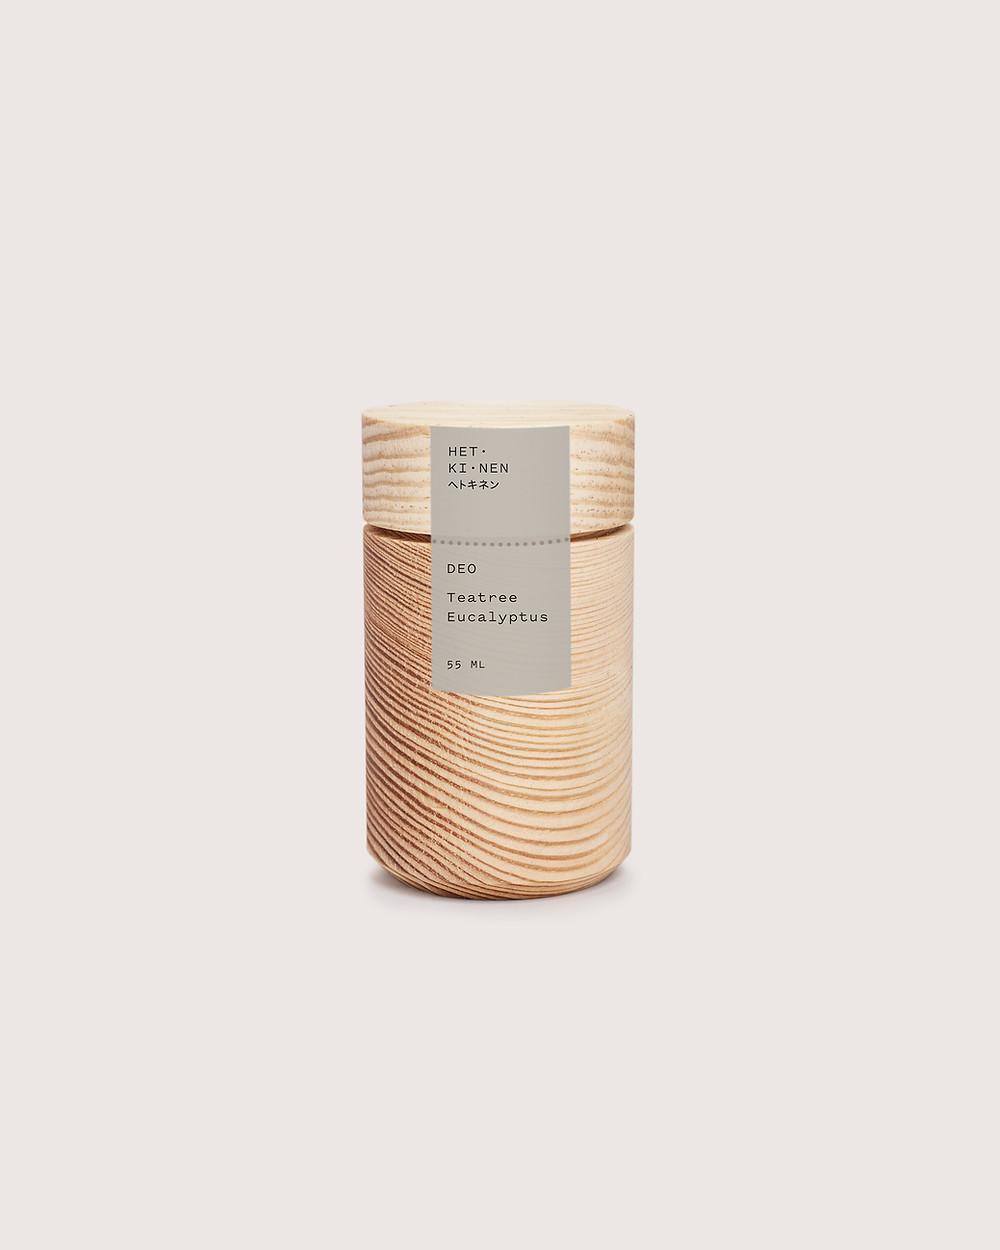 Koti Lifestyle | Hetkinen Deo in a pine jar